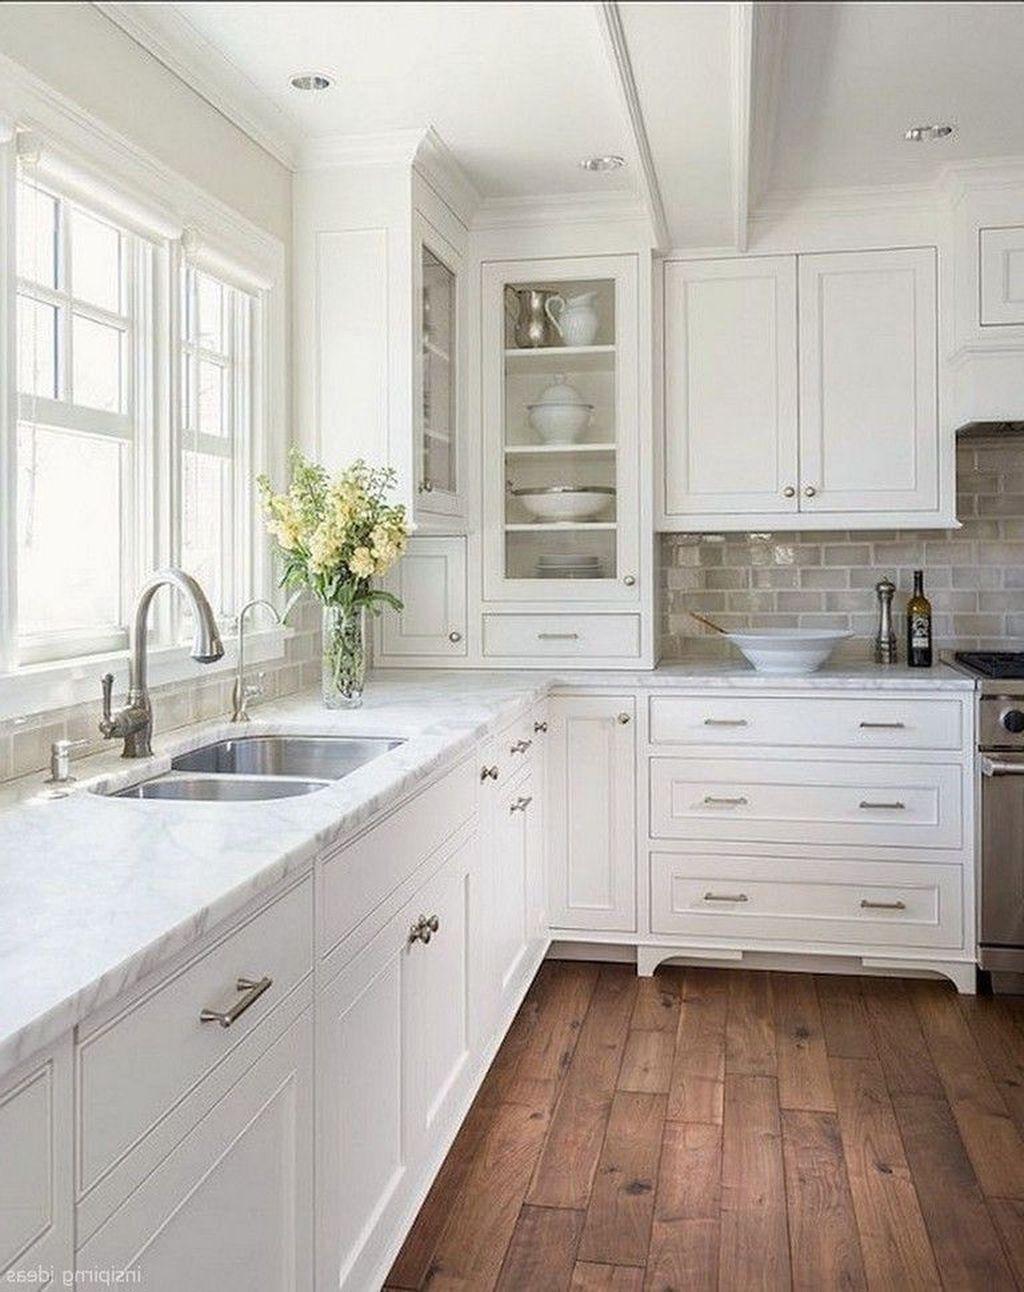 49 Fancy White Kitchen Design And Decor Ideas That Looks Cool Kitchen Cabinet Design White Kitchen Design Farmhouse Kitchen Design